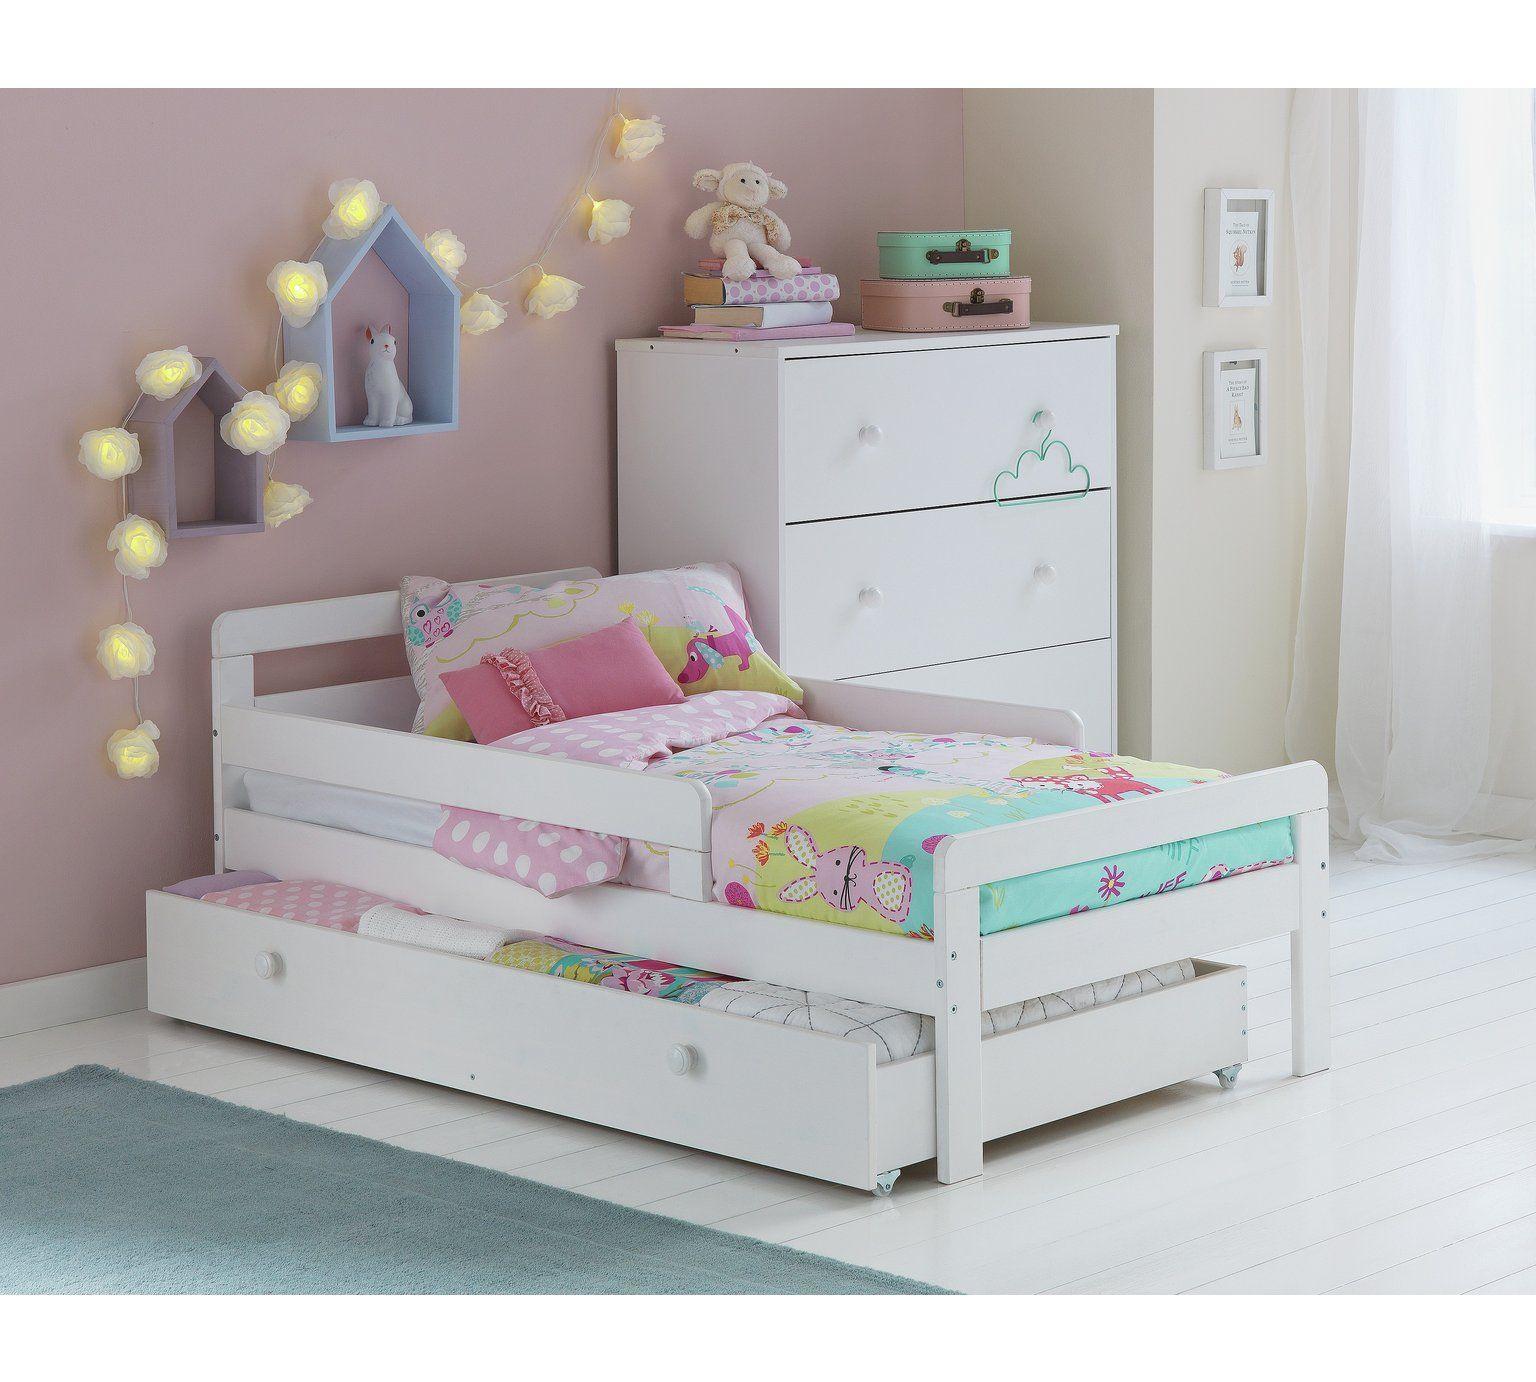 Buy Argos Home Ellis Toddler Bed Frame With Storage White Kids